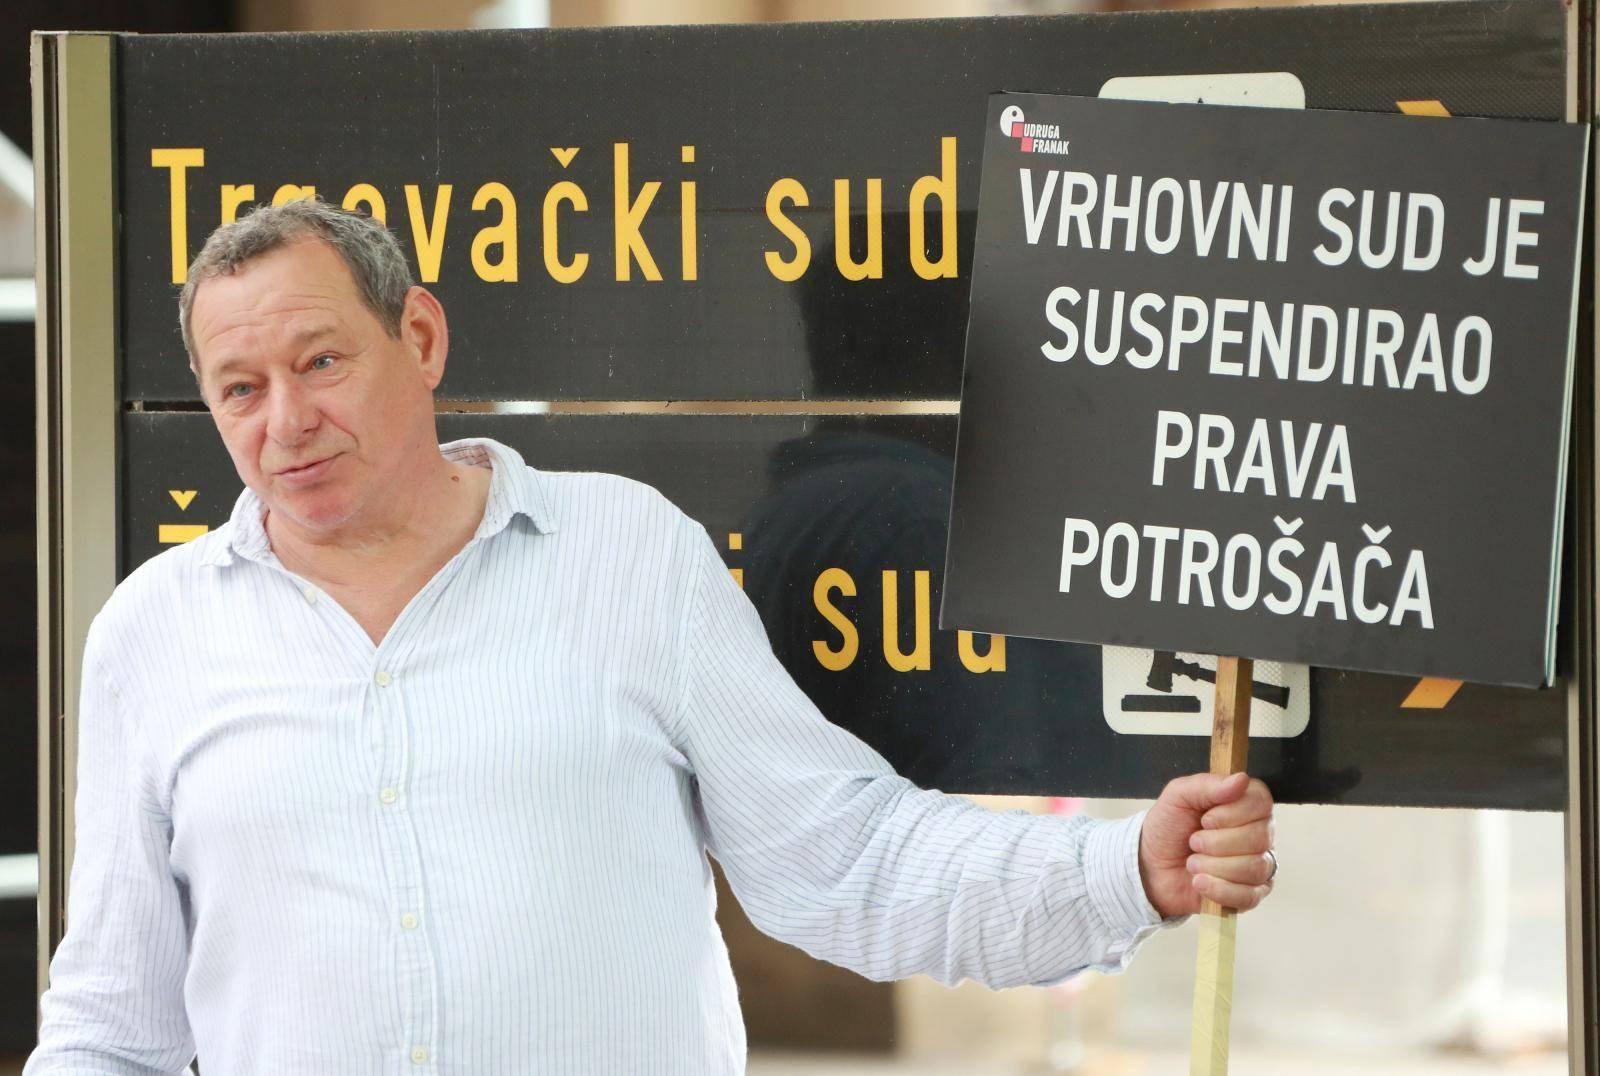 Zagreb: Udruga Franak održala konferenciju za medije na Zrinjevcu